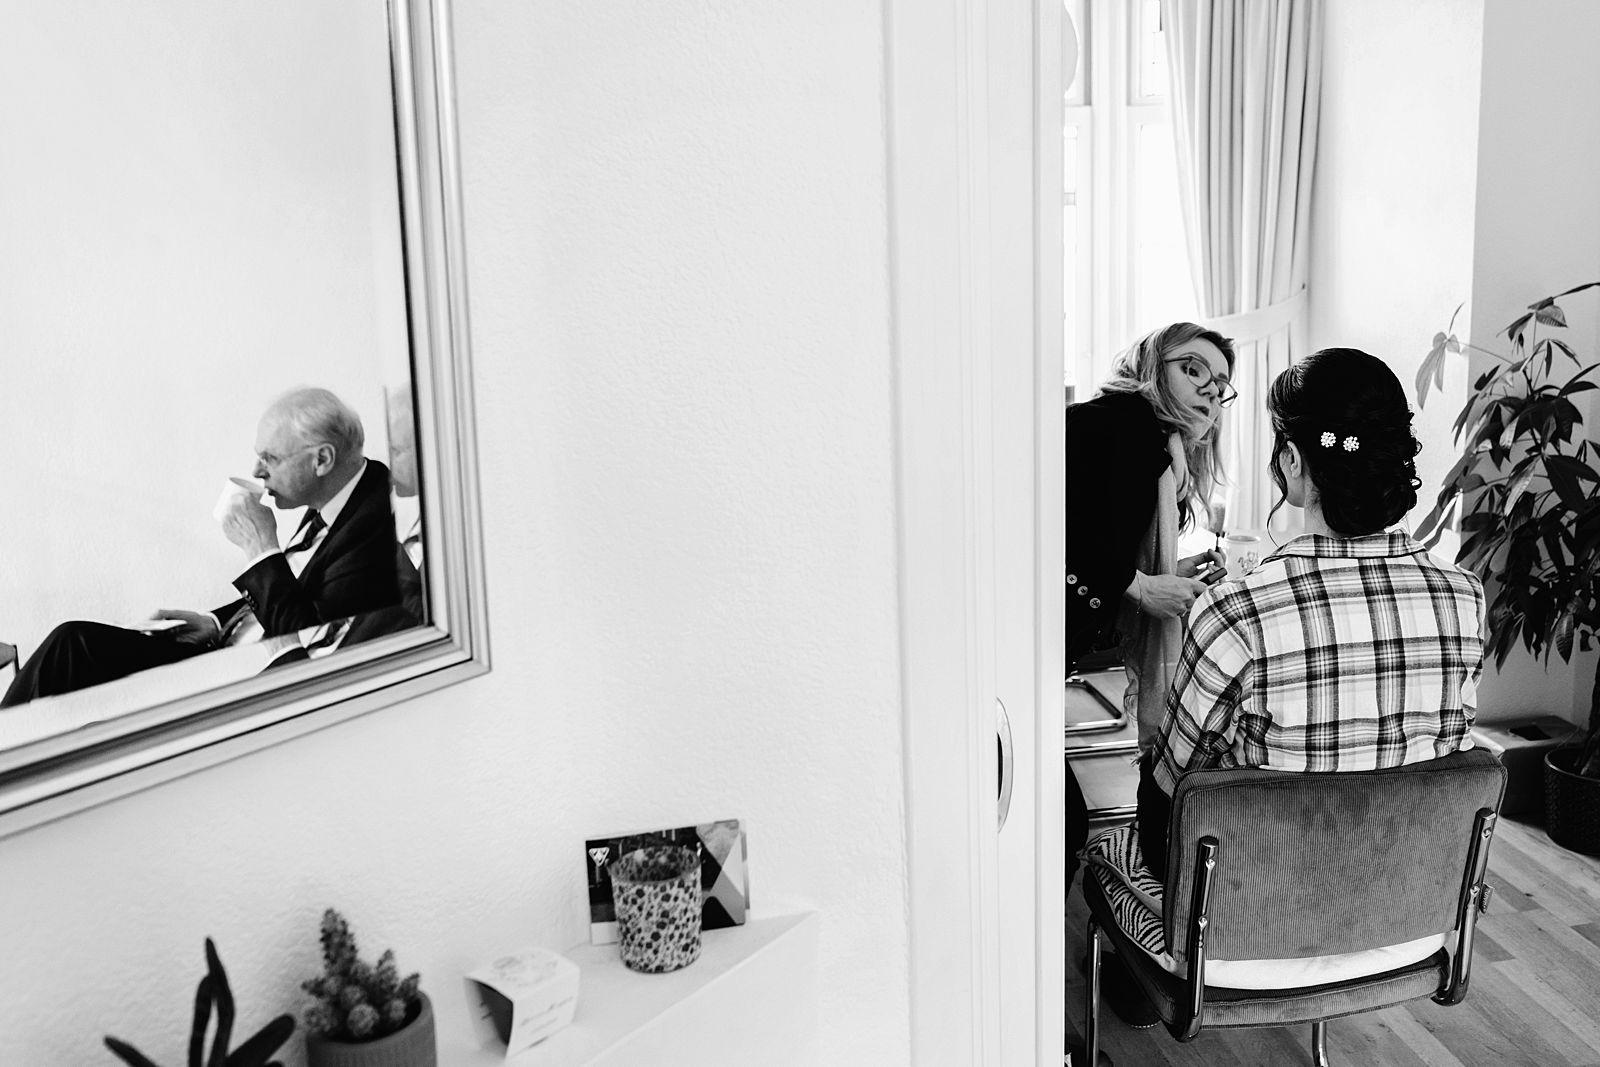 RUUDC Fotografie, trouwen in Leiden, bruiloft in Leiden, trouwen in Zuid-Holland, bruidsfotograaf Leiden, trouwfotograaf Leiden, bruidfotograaf Zuid-Holland, trouwfotograaf Zuid-Holland, trouwfoto's Leiden, trouwlocatie Leiden, huwelijk Leiden, huwelijk Zuid-Holland, de burcht leiden, trouwen de burcht leiden, grand cafe de burcht, trouwen de burcht, bruiloft de burcht leiden